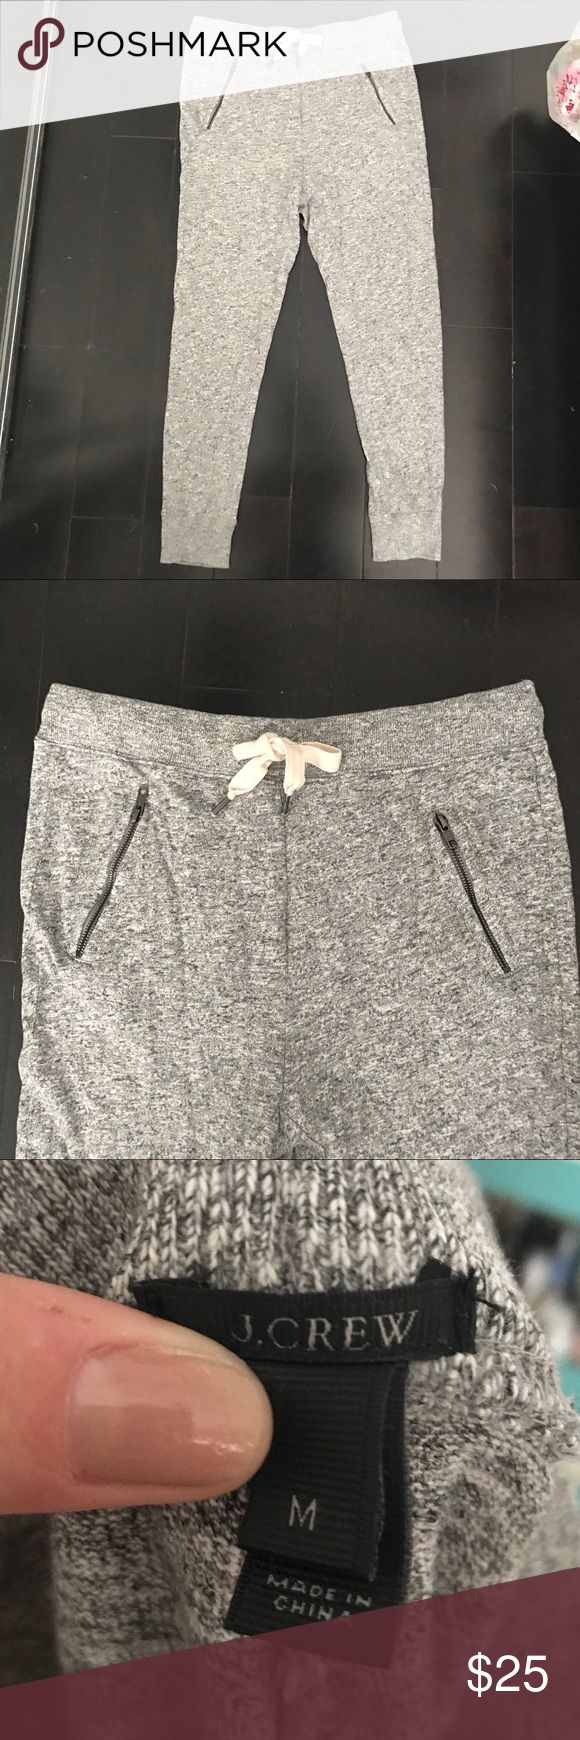 J Crew Gray Sweatpants Joggers with zipper detail So soft! Excellent condition. J Crew Heather Gray Sweatpants with zipper detail. Slight drop crotch look. J. Crew Pants Track Pants & Joggers